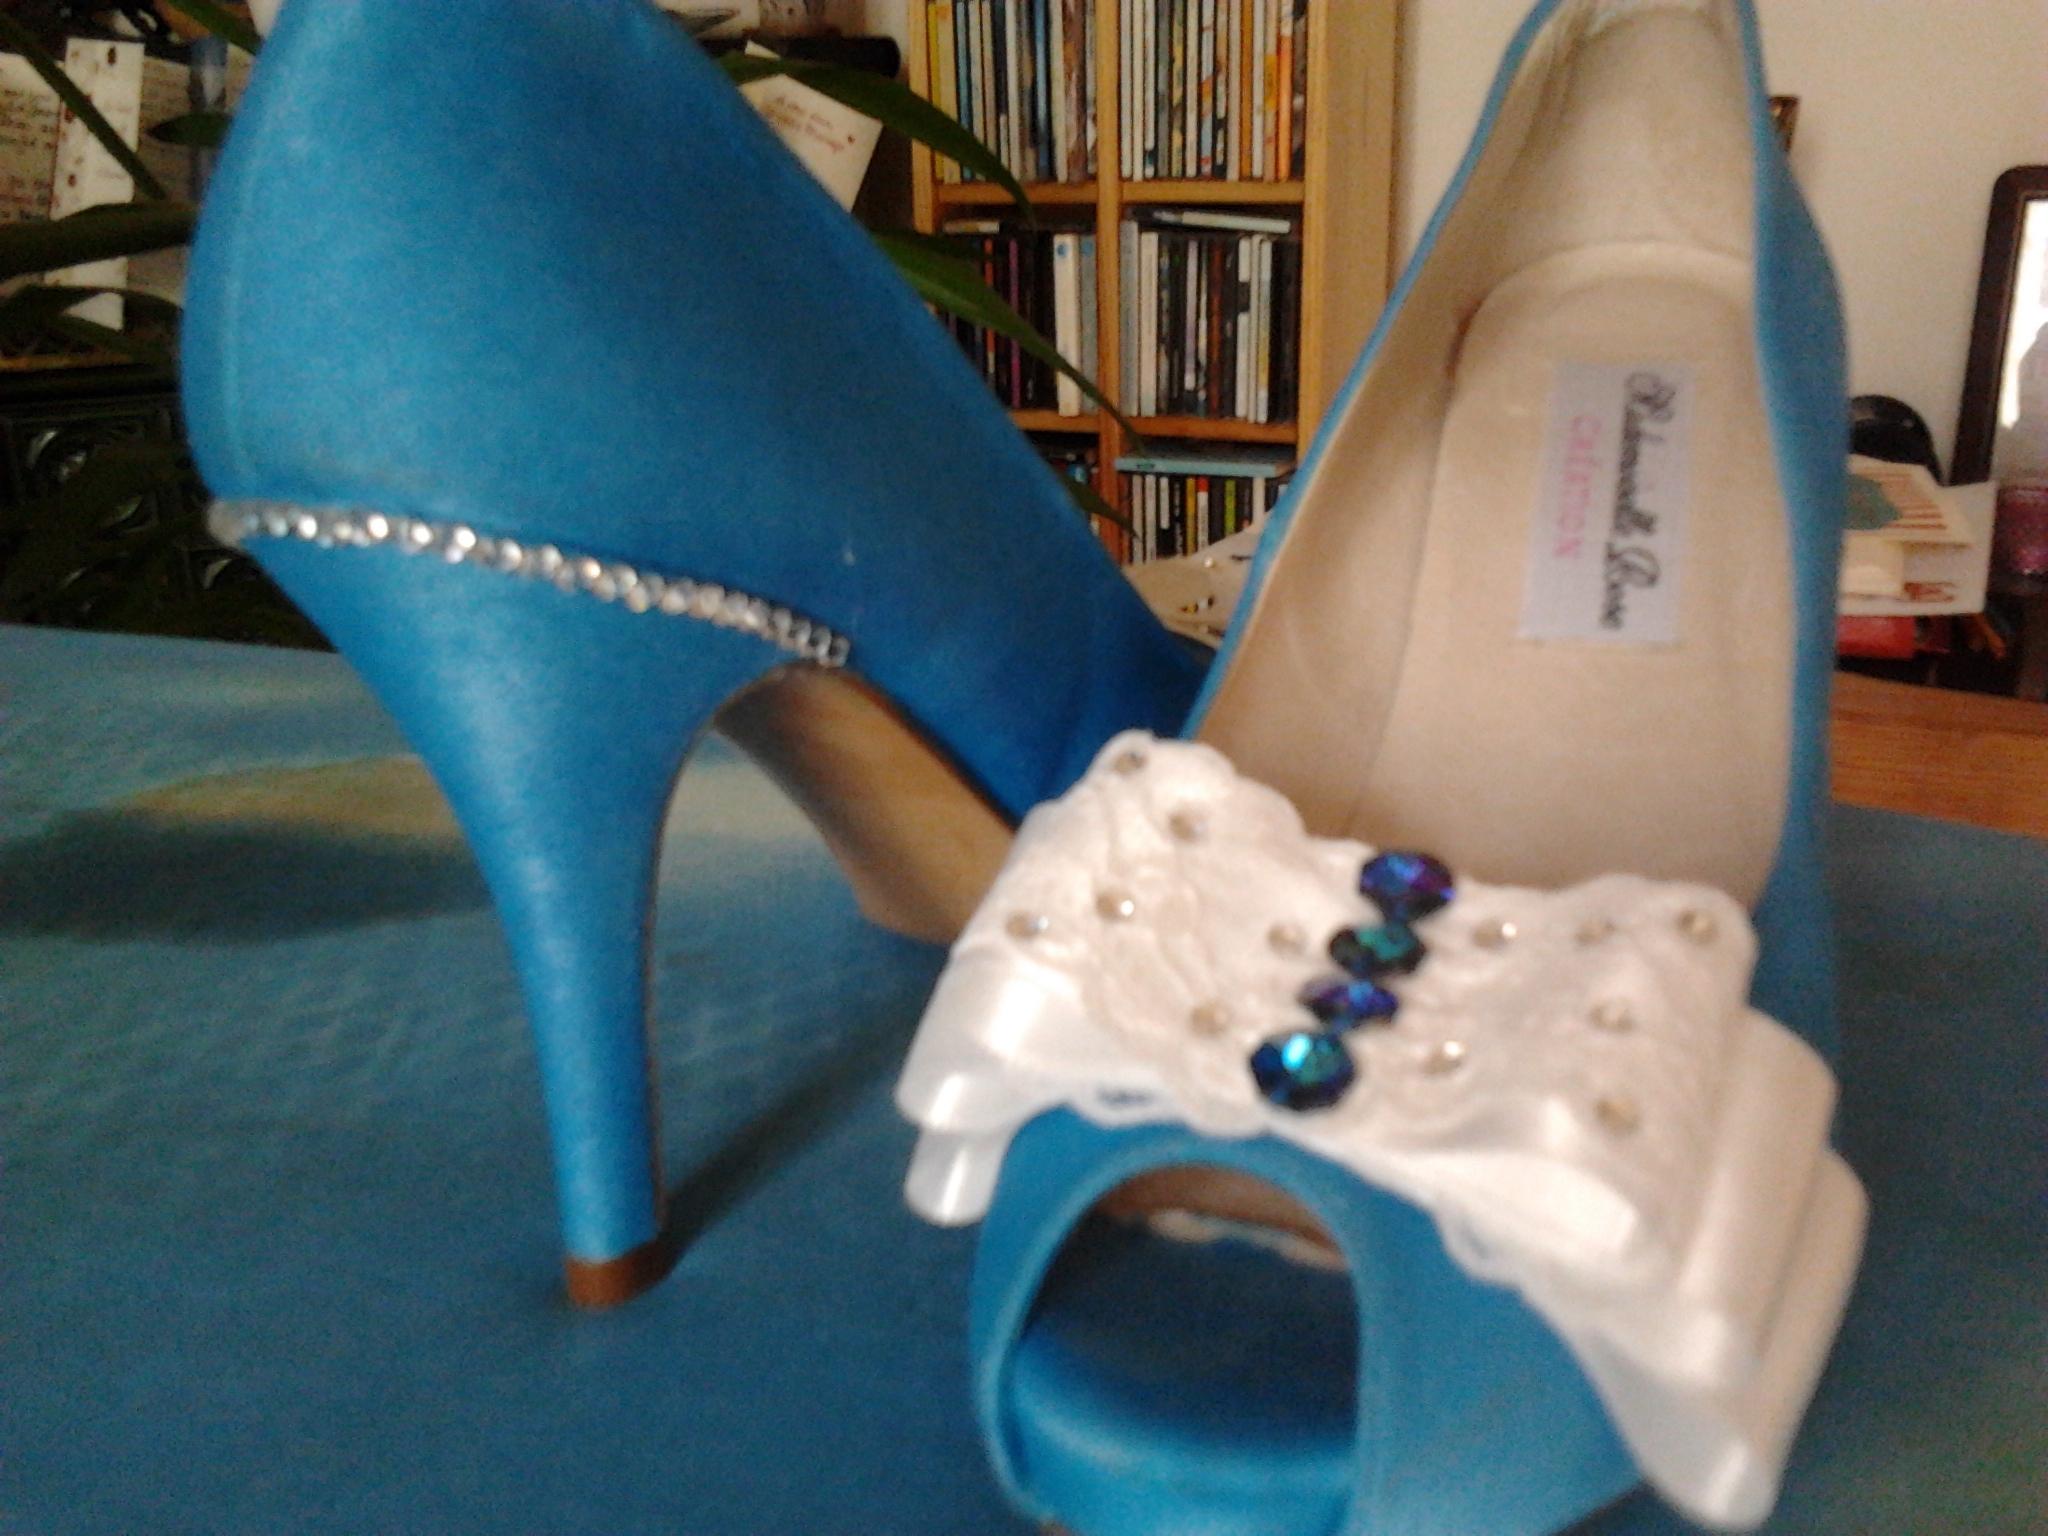 Paris Wedding Wednesday : Garter Battle & Giveaway!